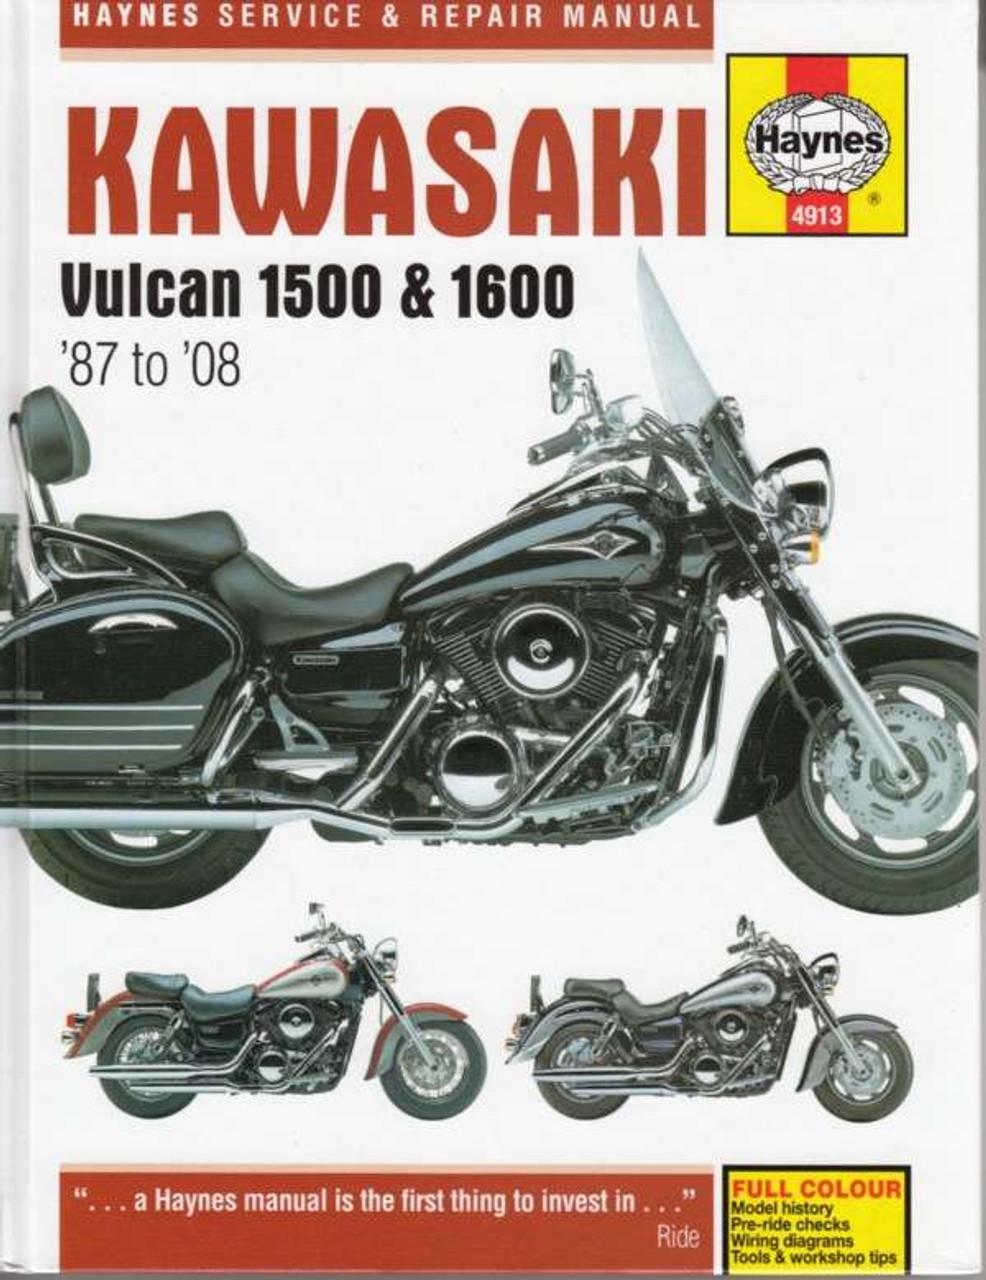 Kawasaki Vulcan 1500 1600 1987 2008 Workshop Manualrhautomotobookshopau: 1999 Kawasaki Vulcan 1500 Wiring Diagram At Gmaili.net